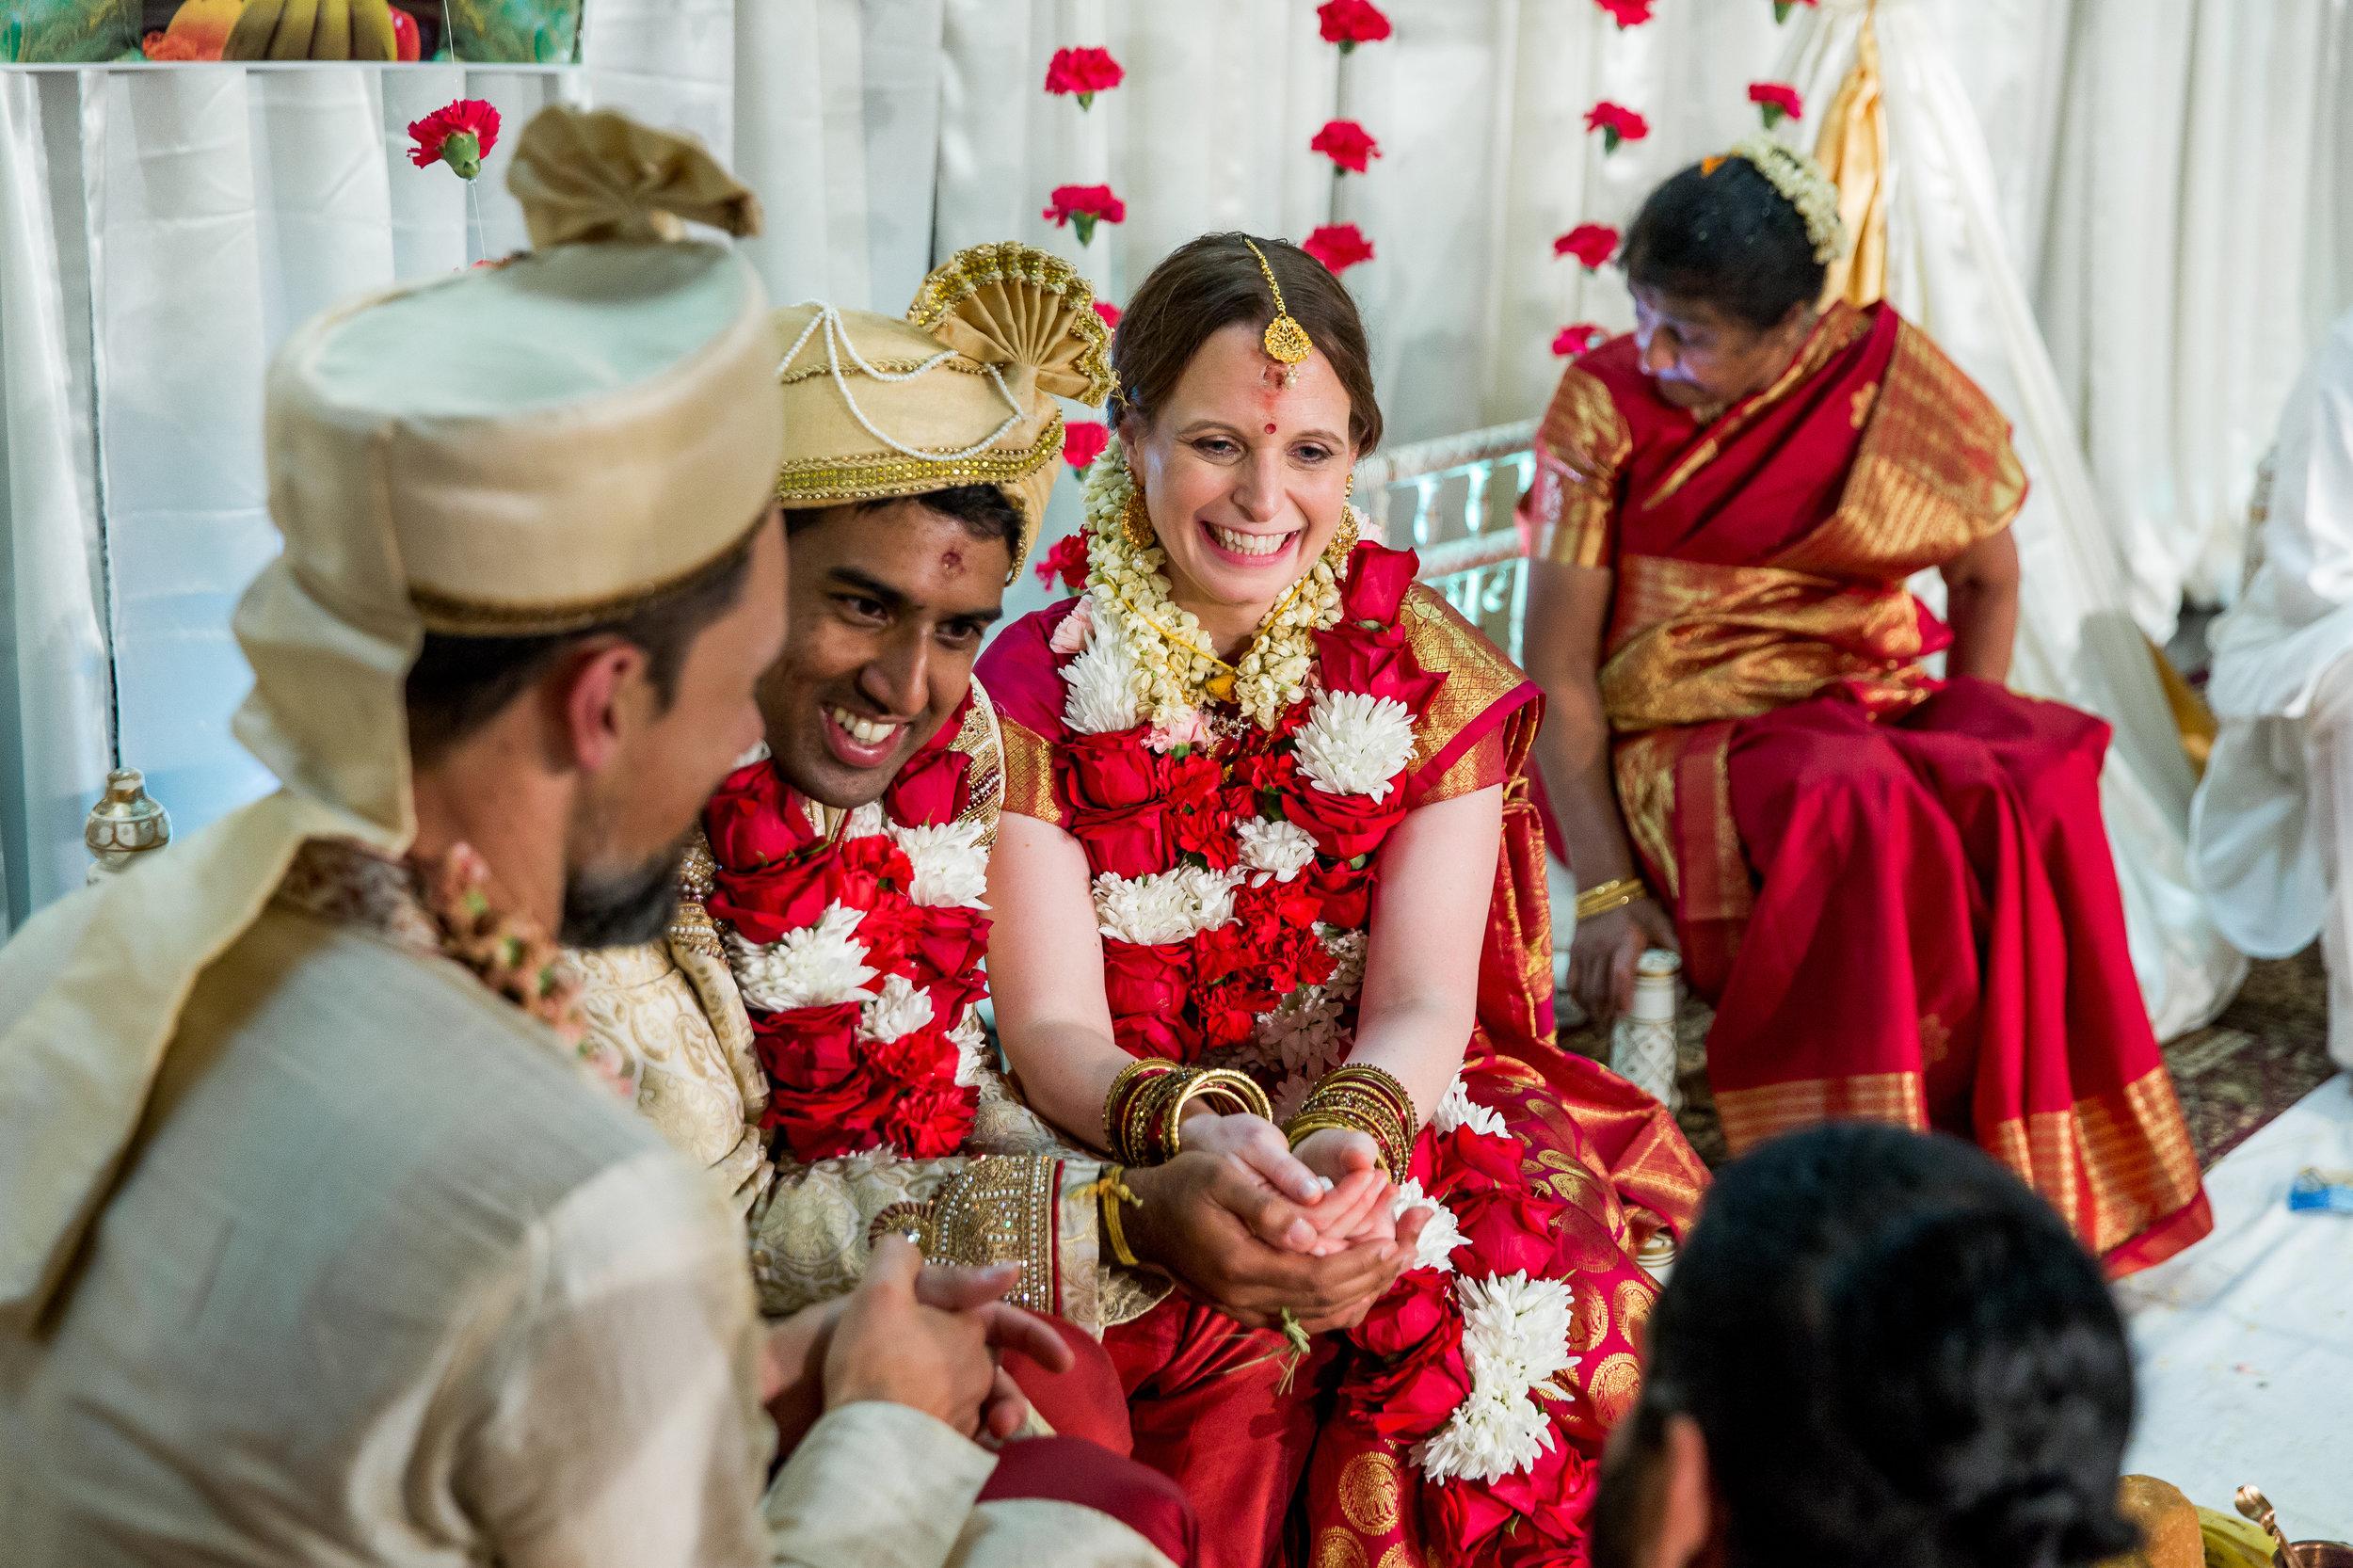 victoriabrianwedding-395.jpg